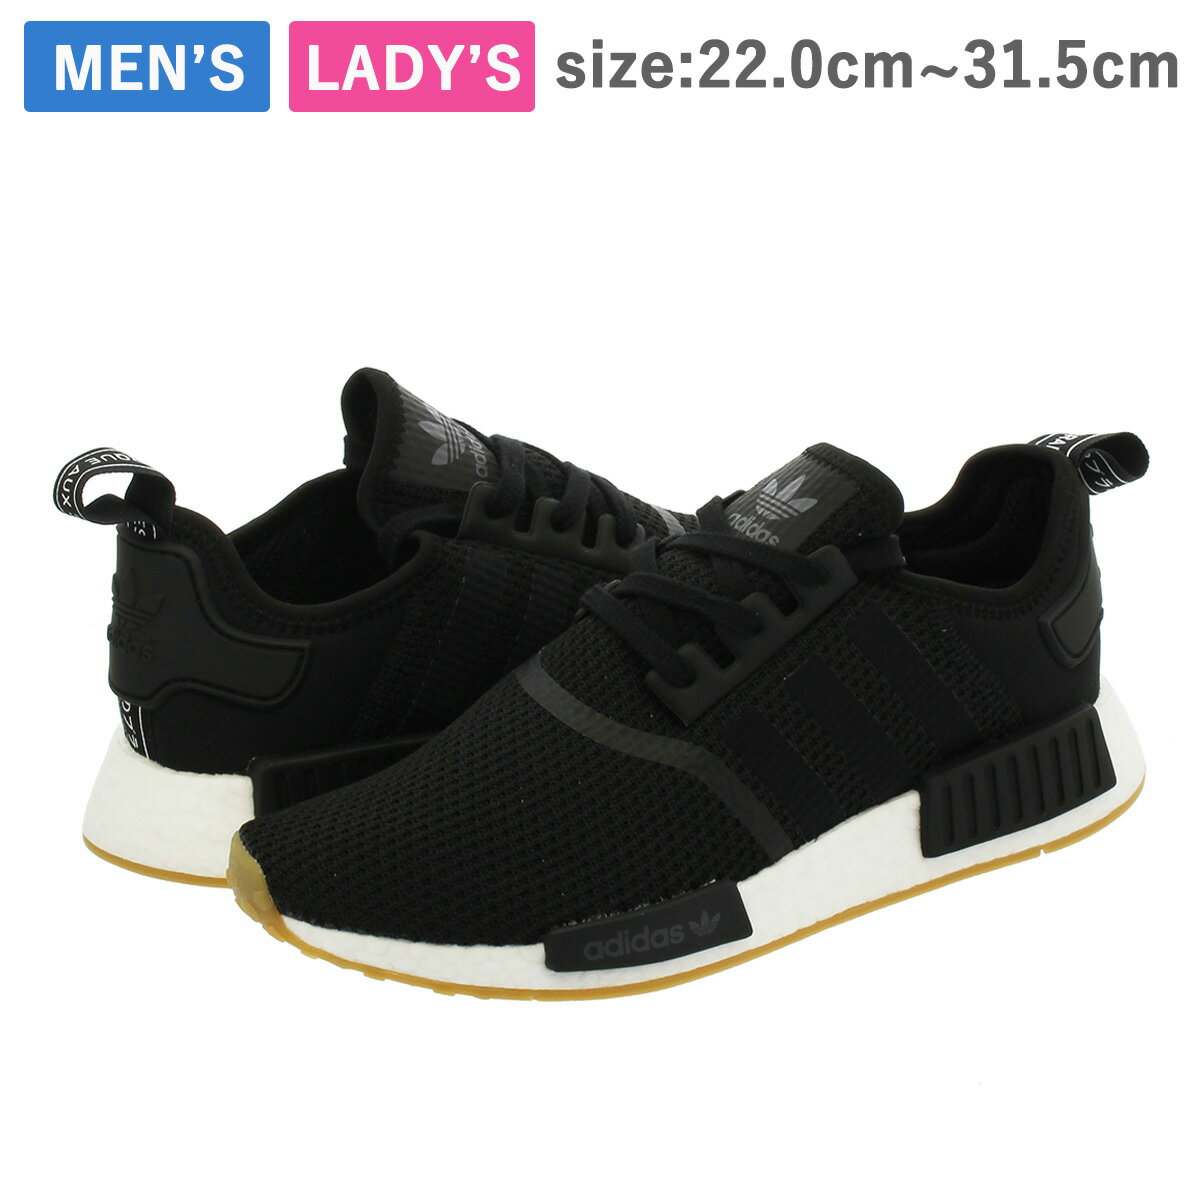 adidas NMD_R1 【adidas Originals】 アディダス ノマド R1 CORE BLACK/CORE BLACK/GUM